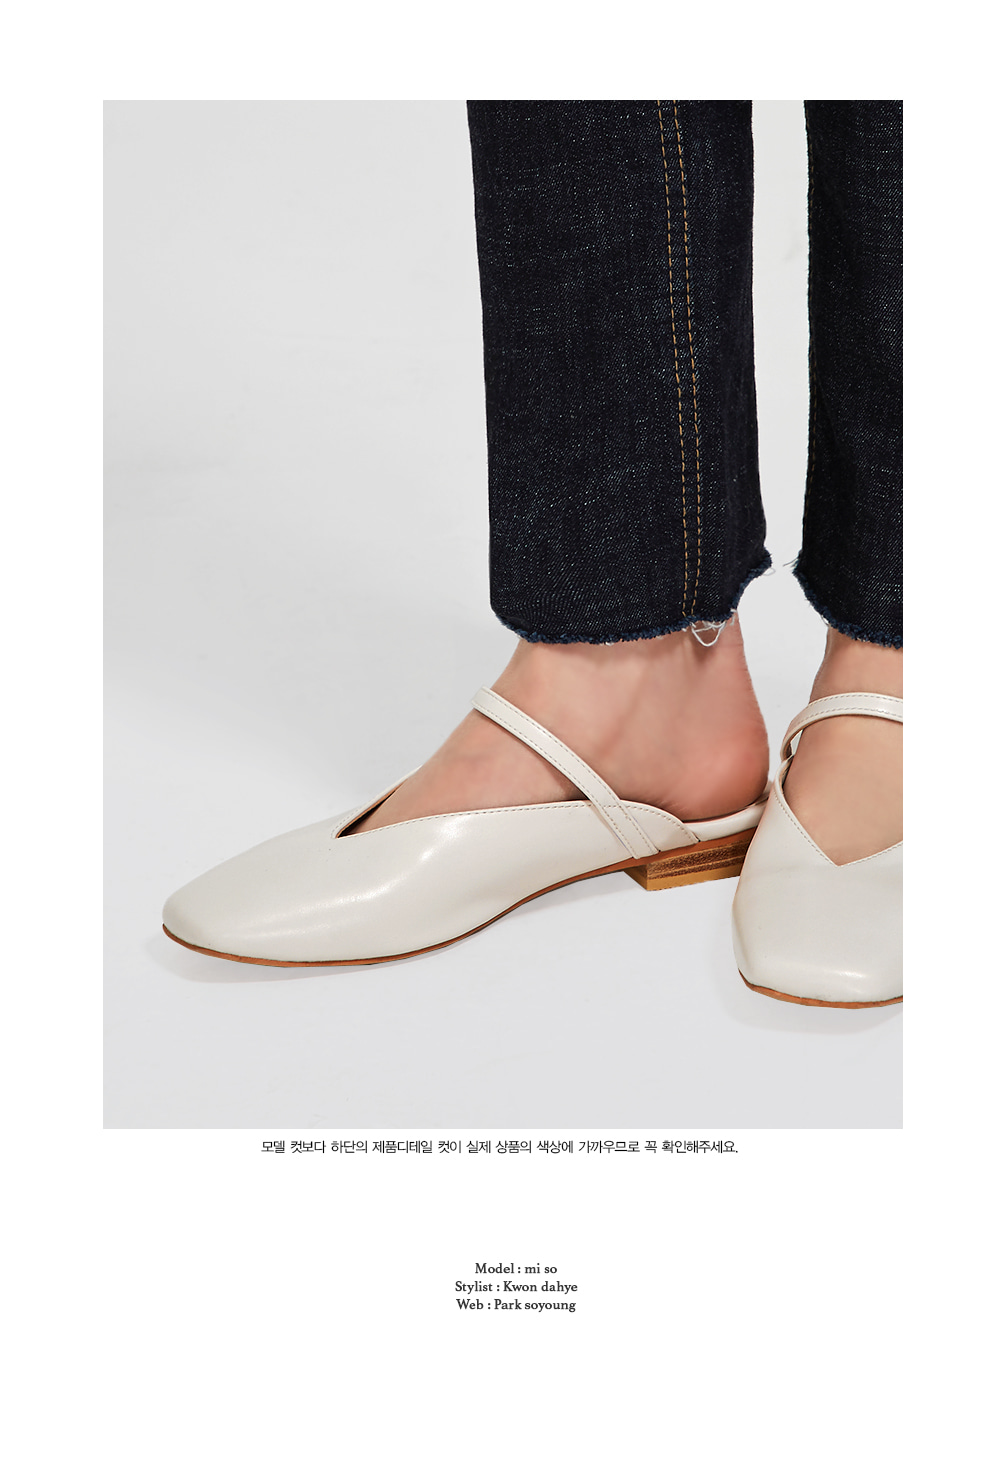 glossy low mule (230-250)